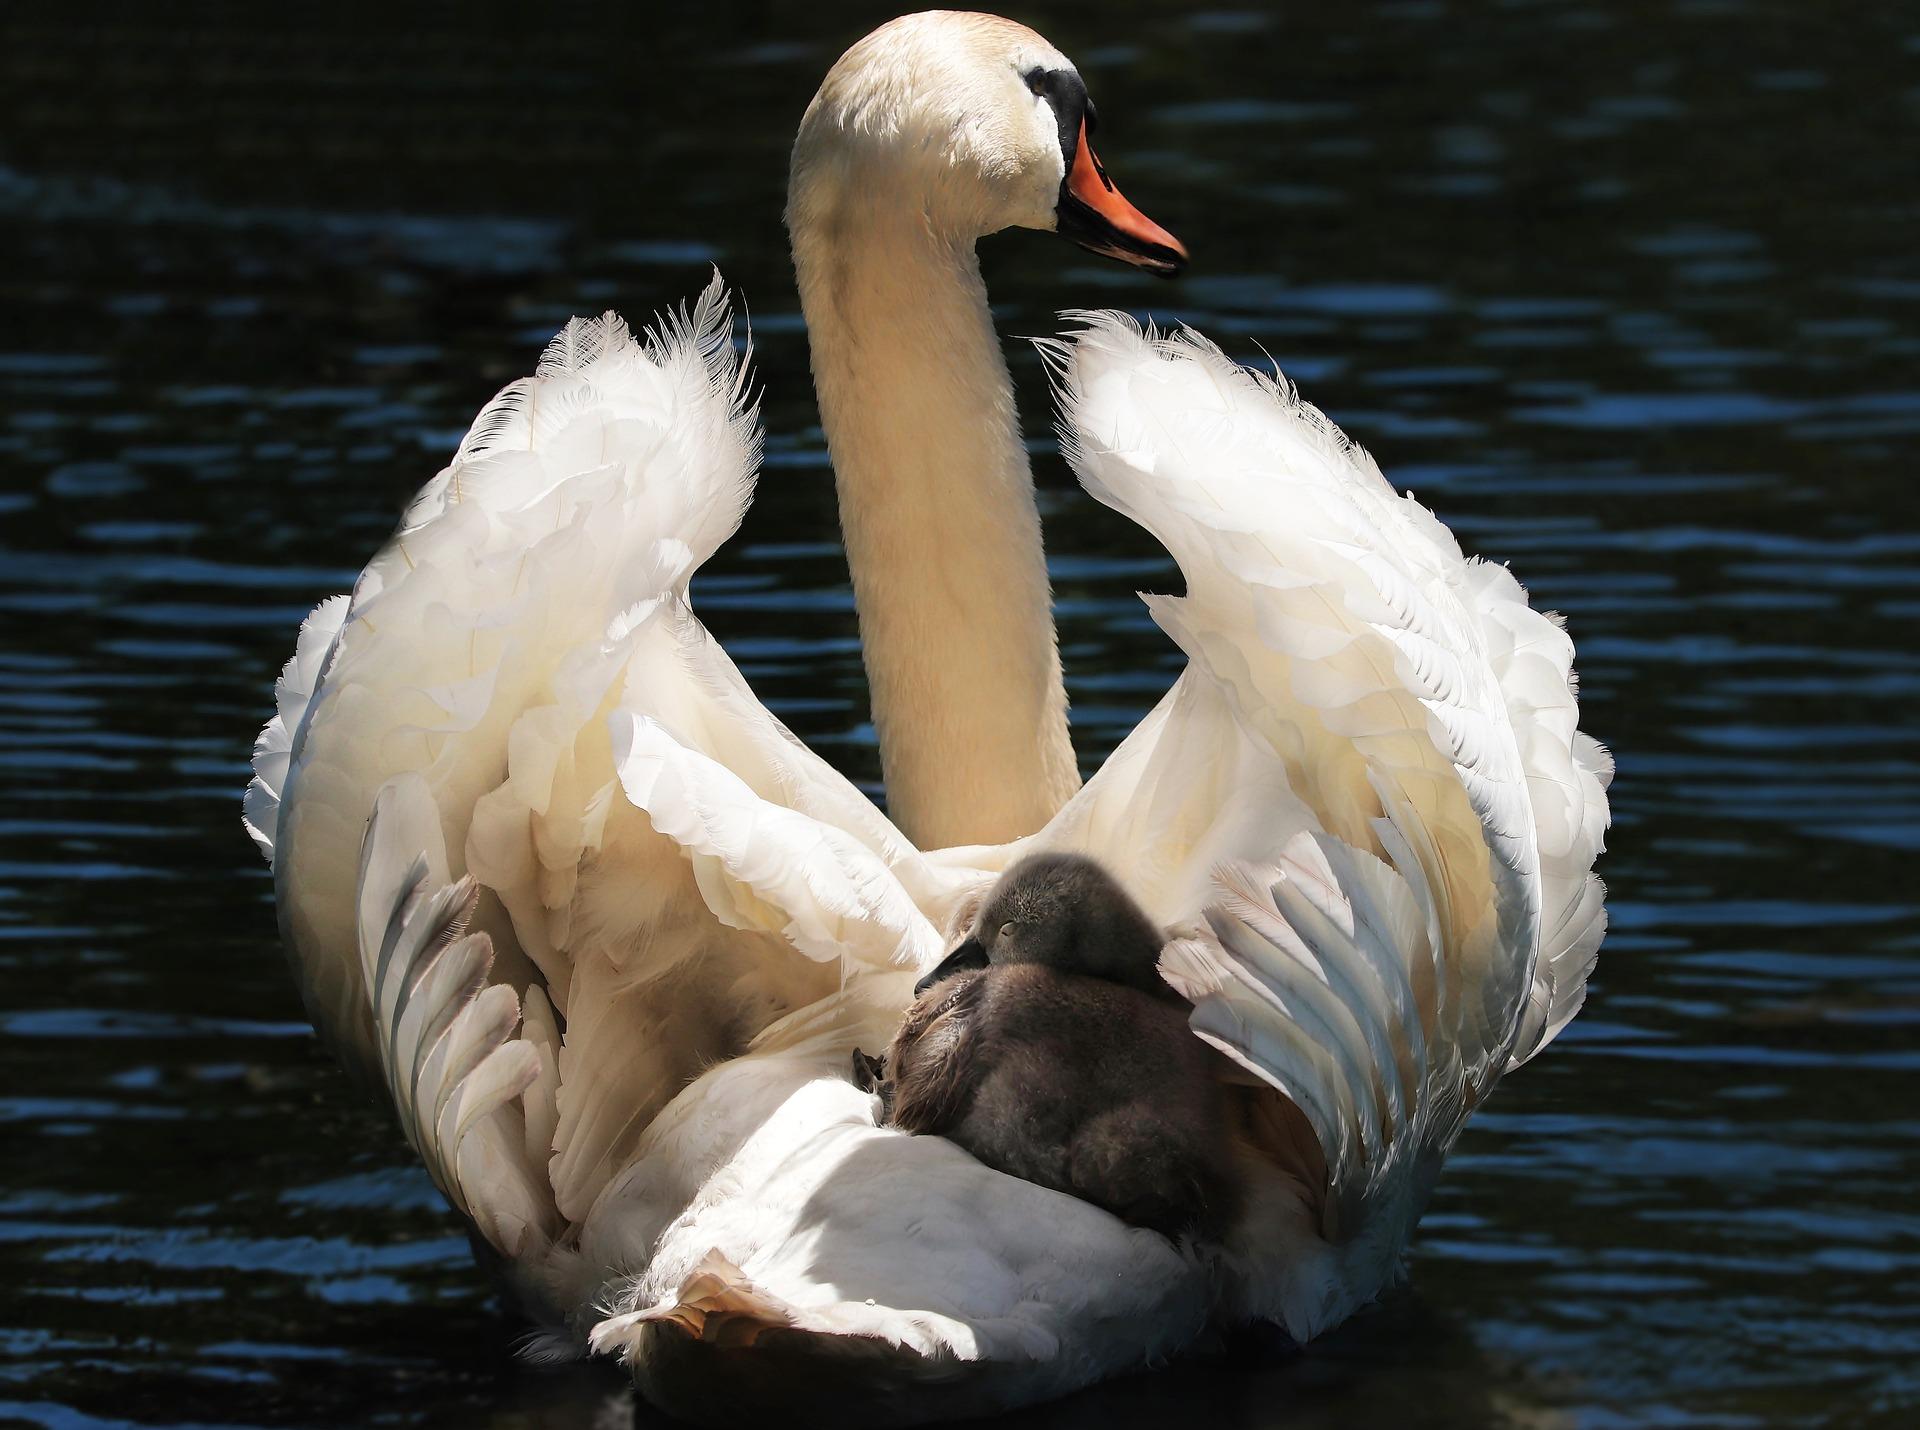 Padres del reino animal Cisne